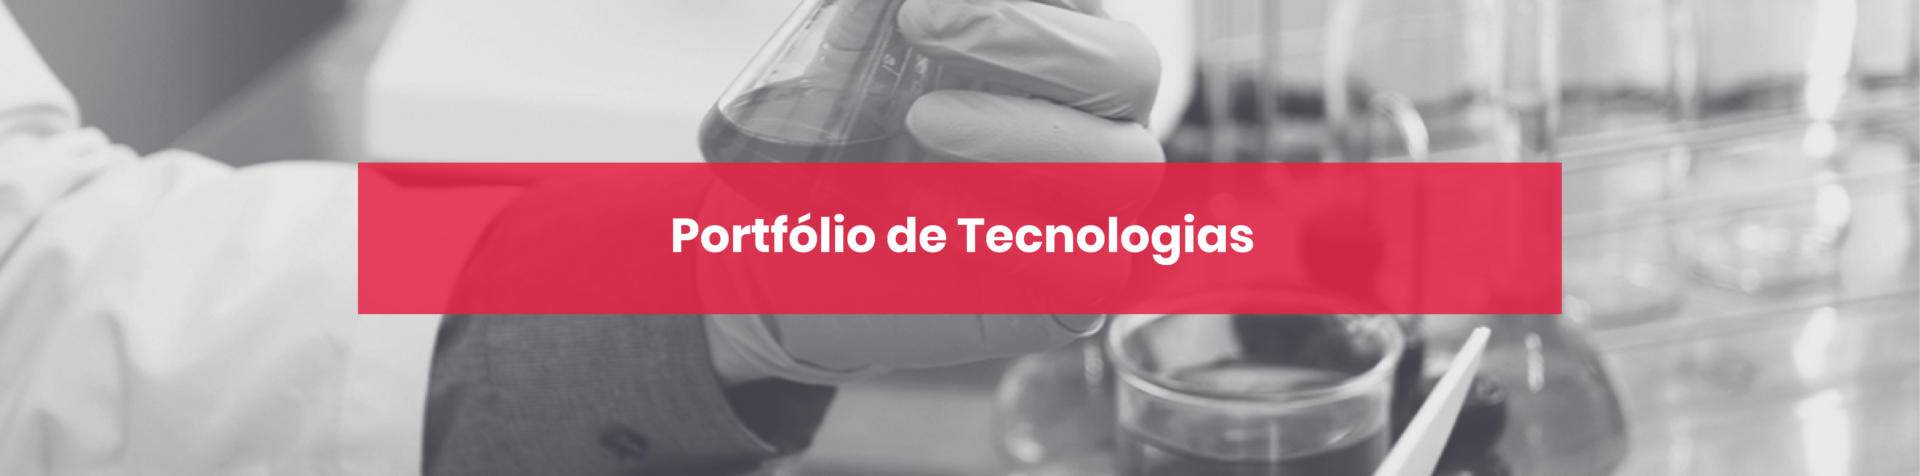 Portfólio de Tecnologias